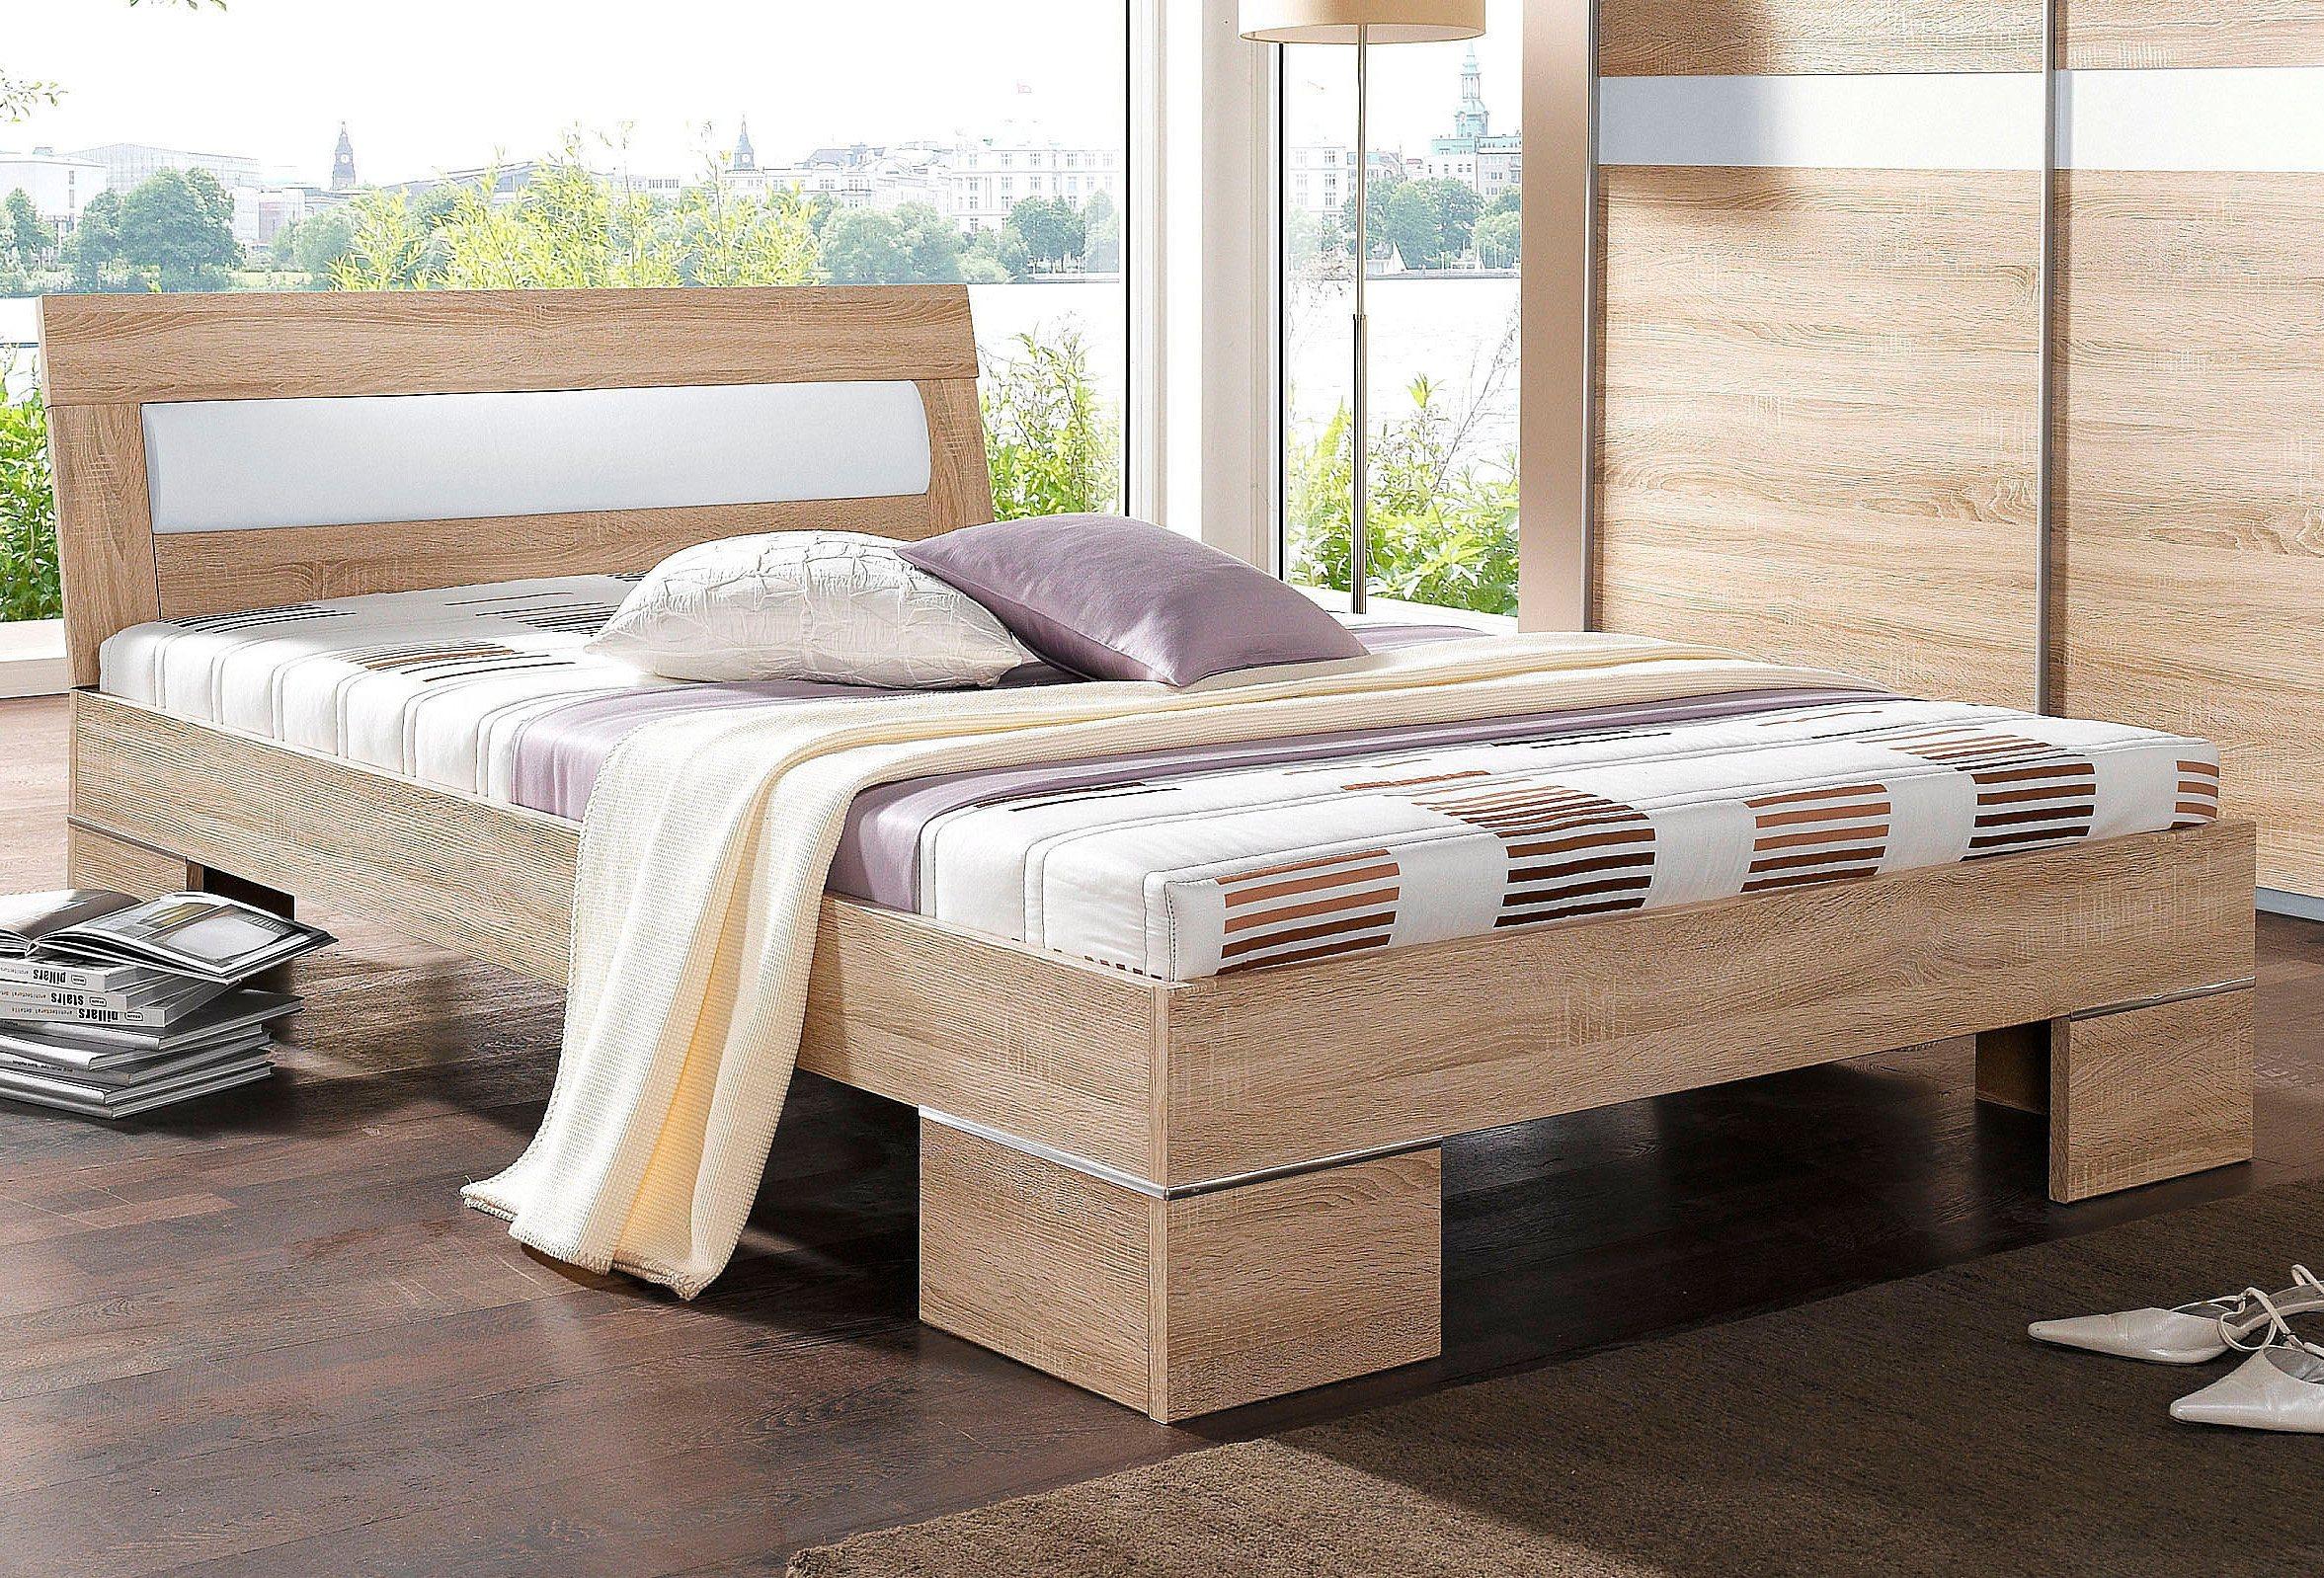 Matraflex Futonbett | Schlafzimmer > Betten > Futonbetten | Hell - Weiß - Dunkel | Polyester | Matraflex